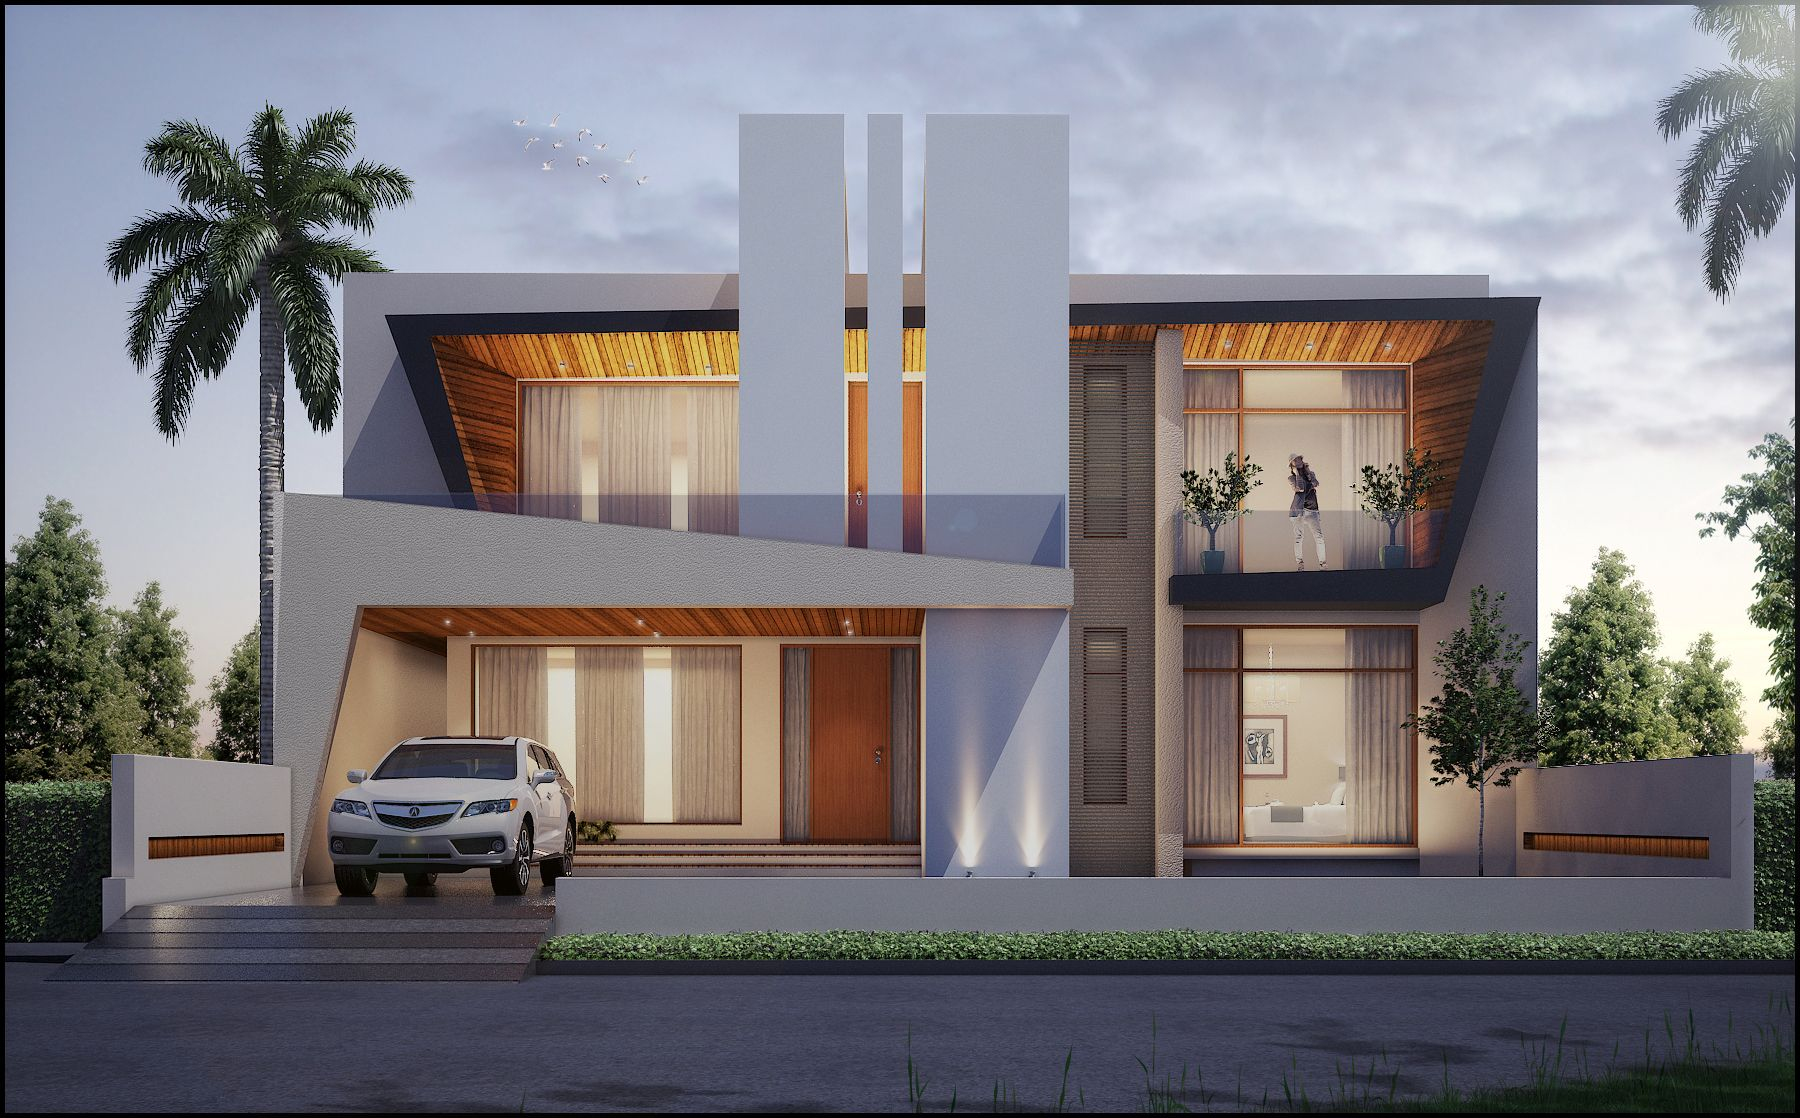 Architect Sukhpal Singh Best Architect Top Interior Designer In Punjab Architect House Architecture House Interior Architecture Design